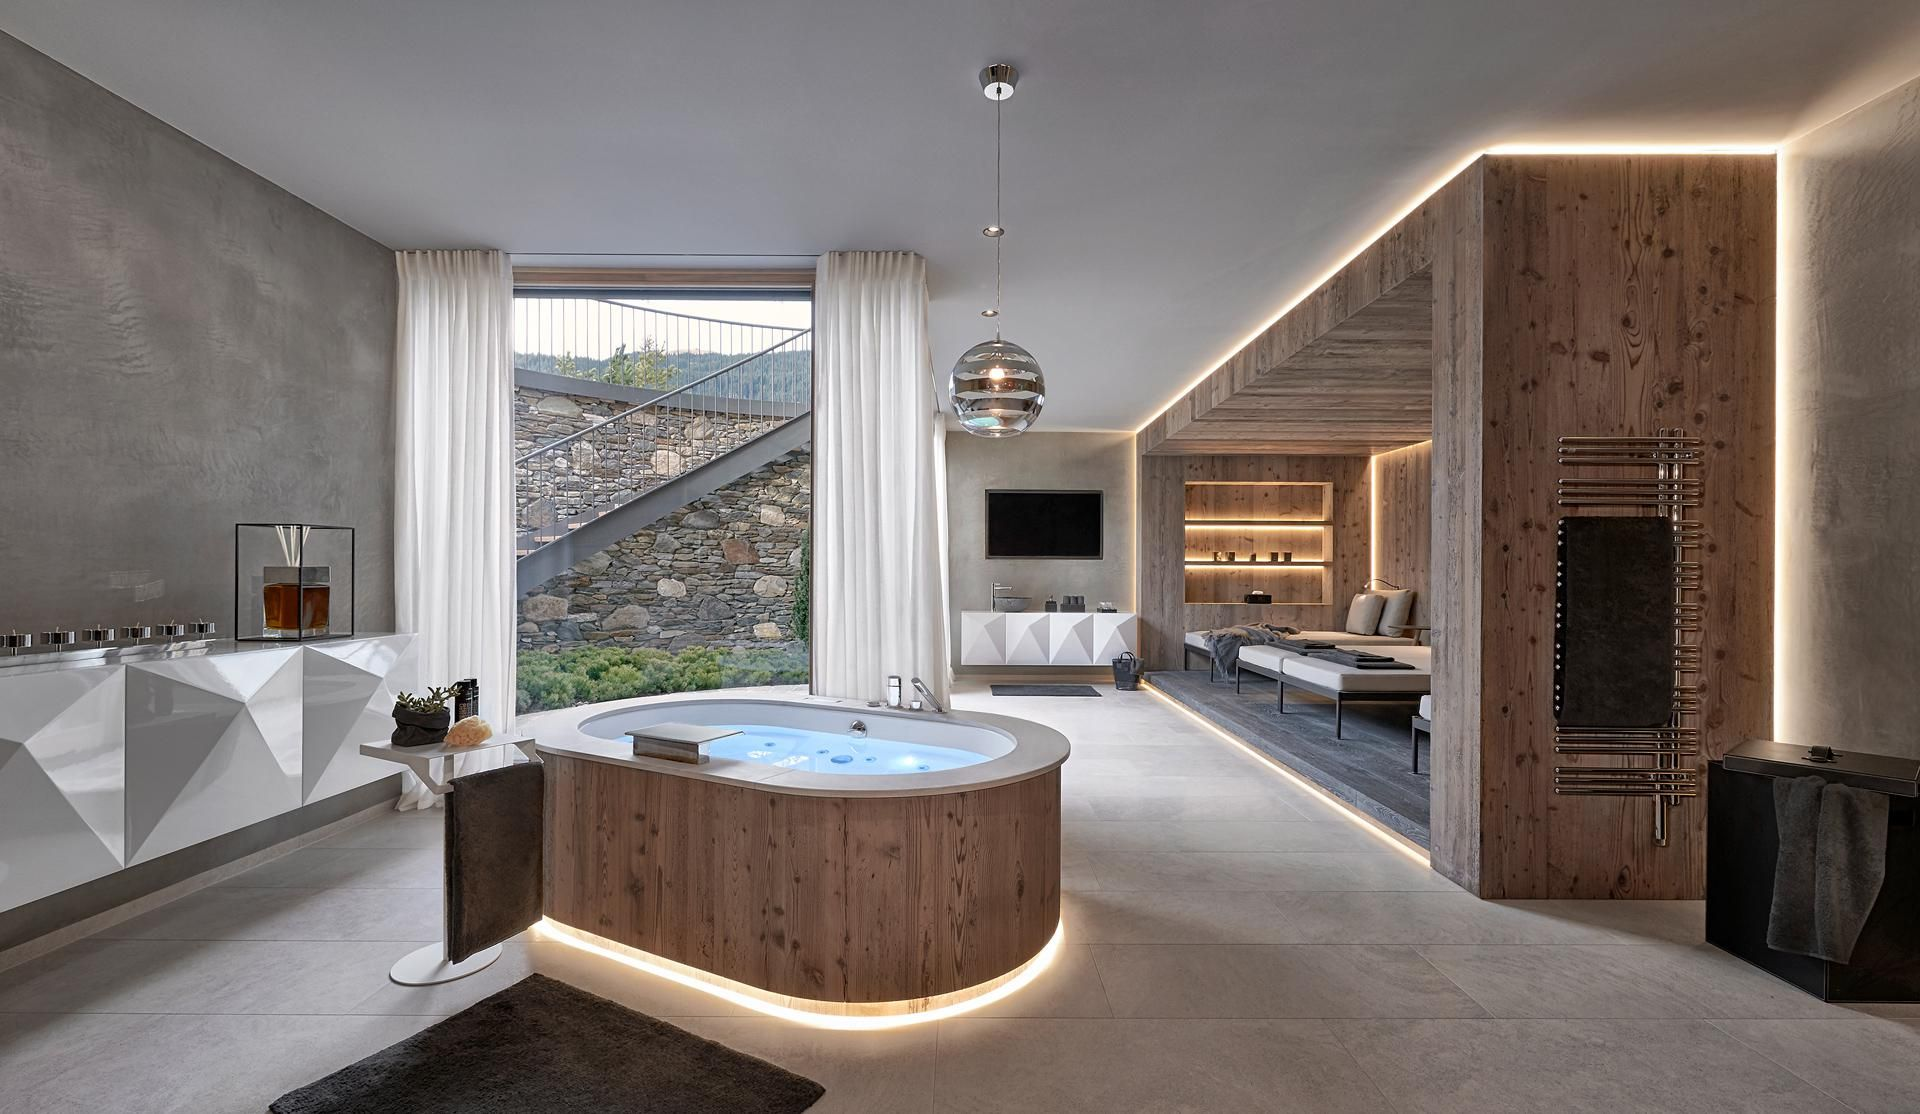 Gasteiger Bad / Kitzbhel / Wellness - Sauna, Dampfbad ...